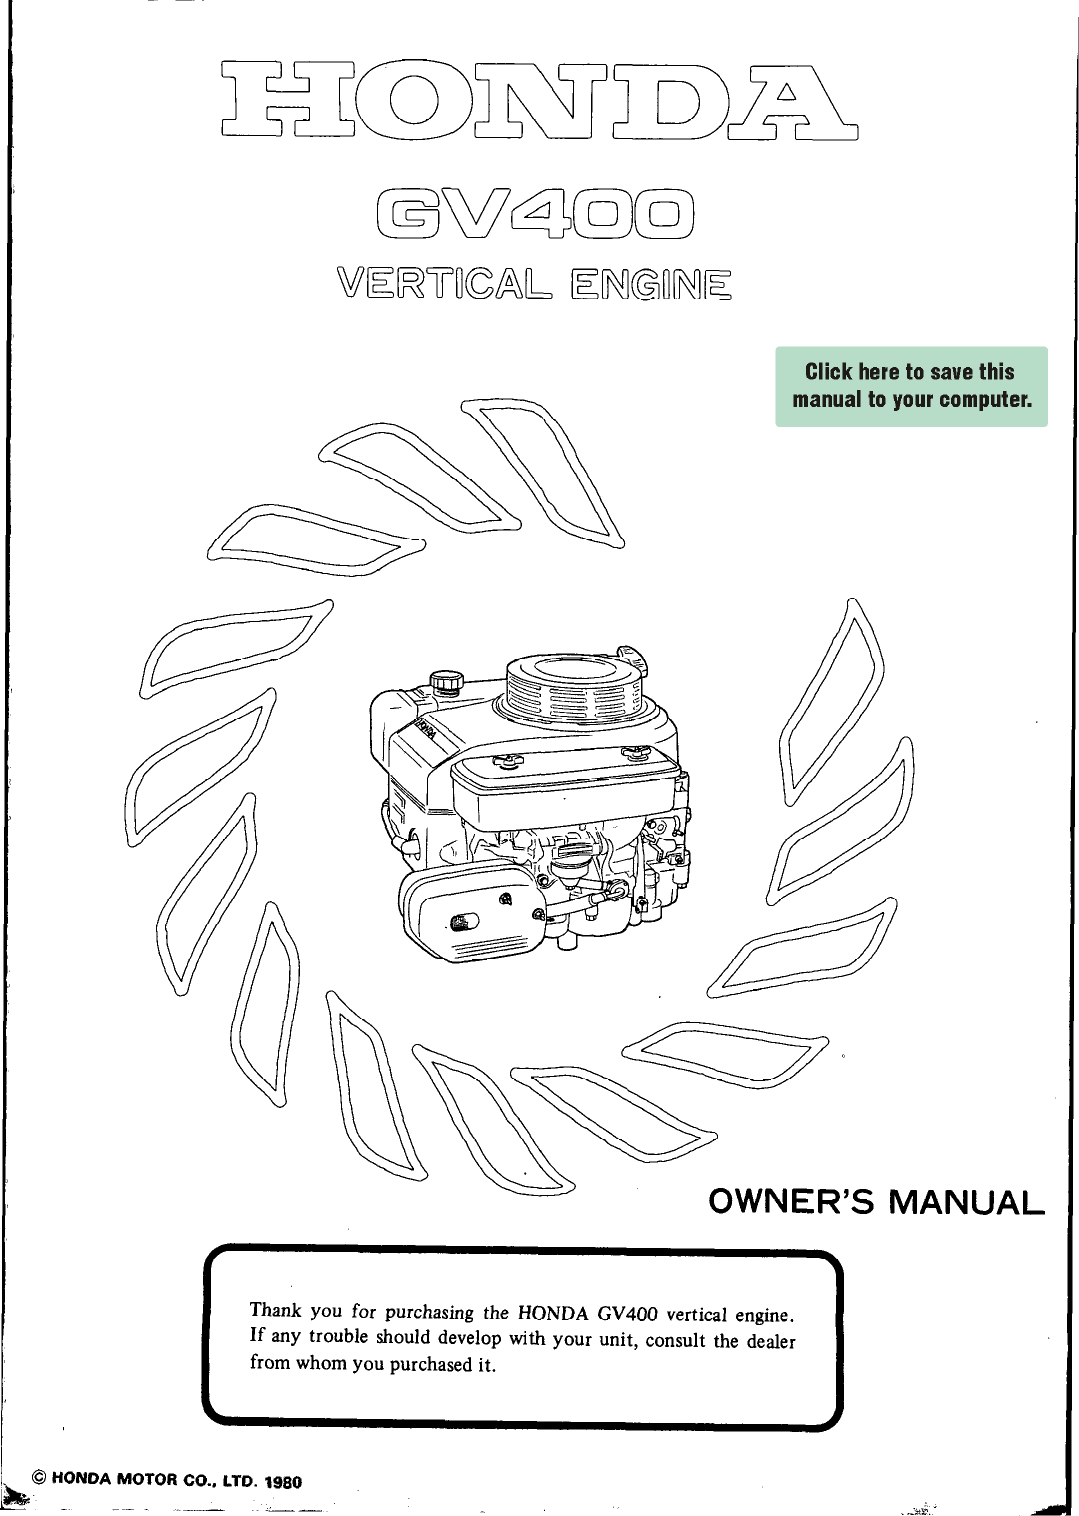 Honda Gv400 Owners Manual